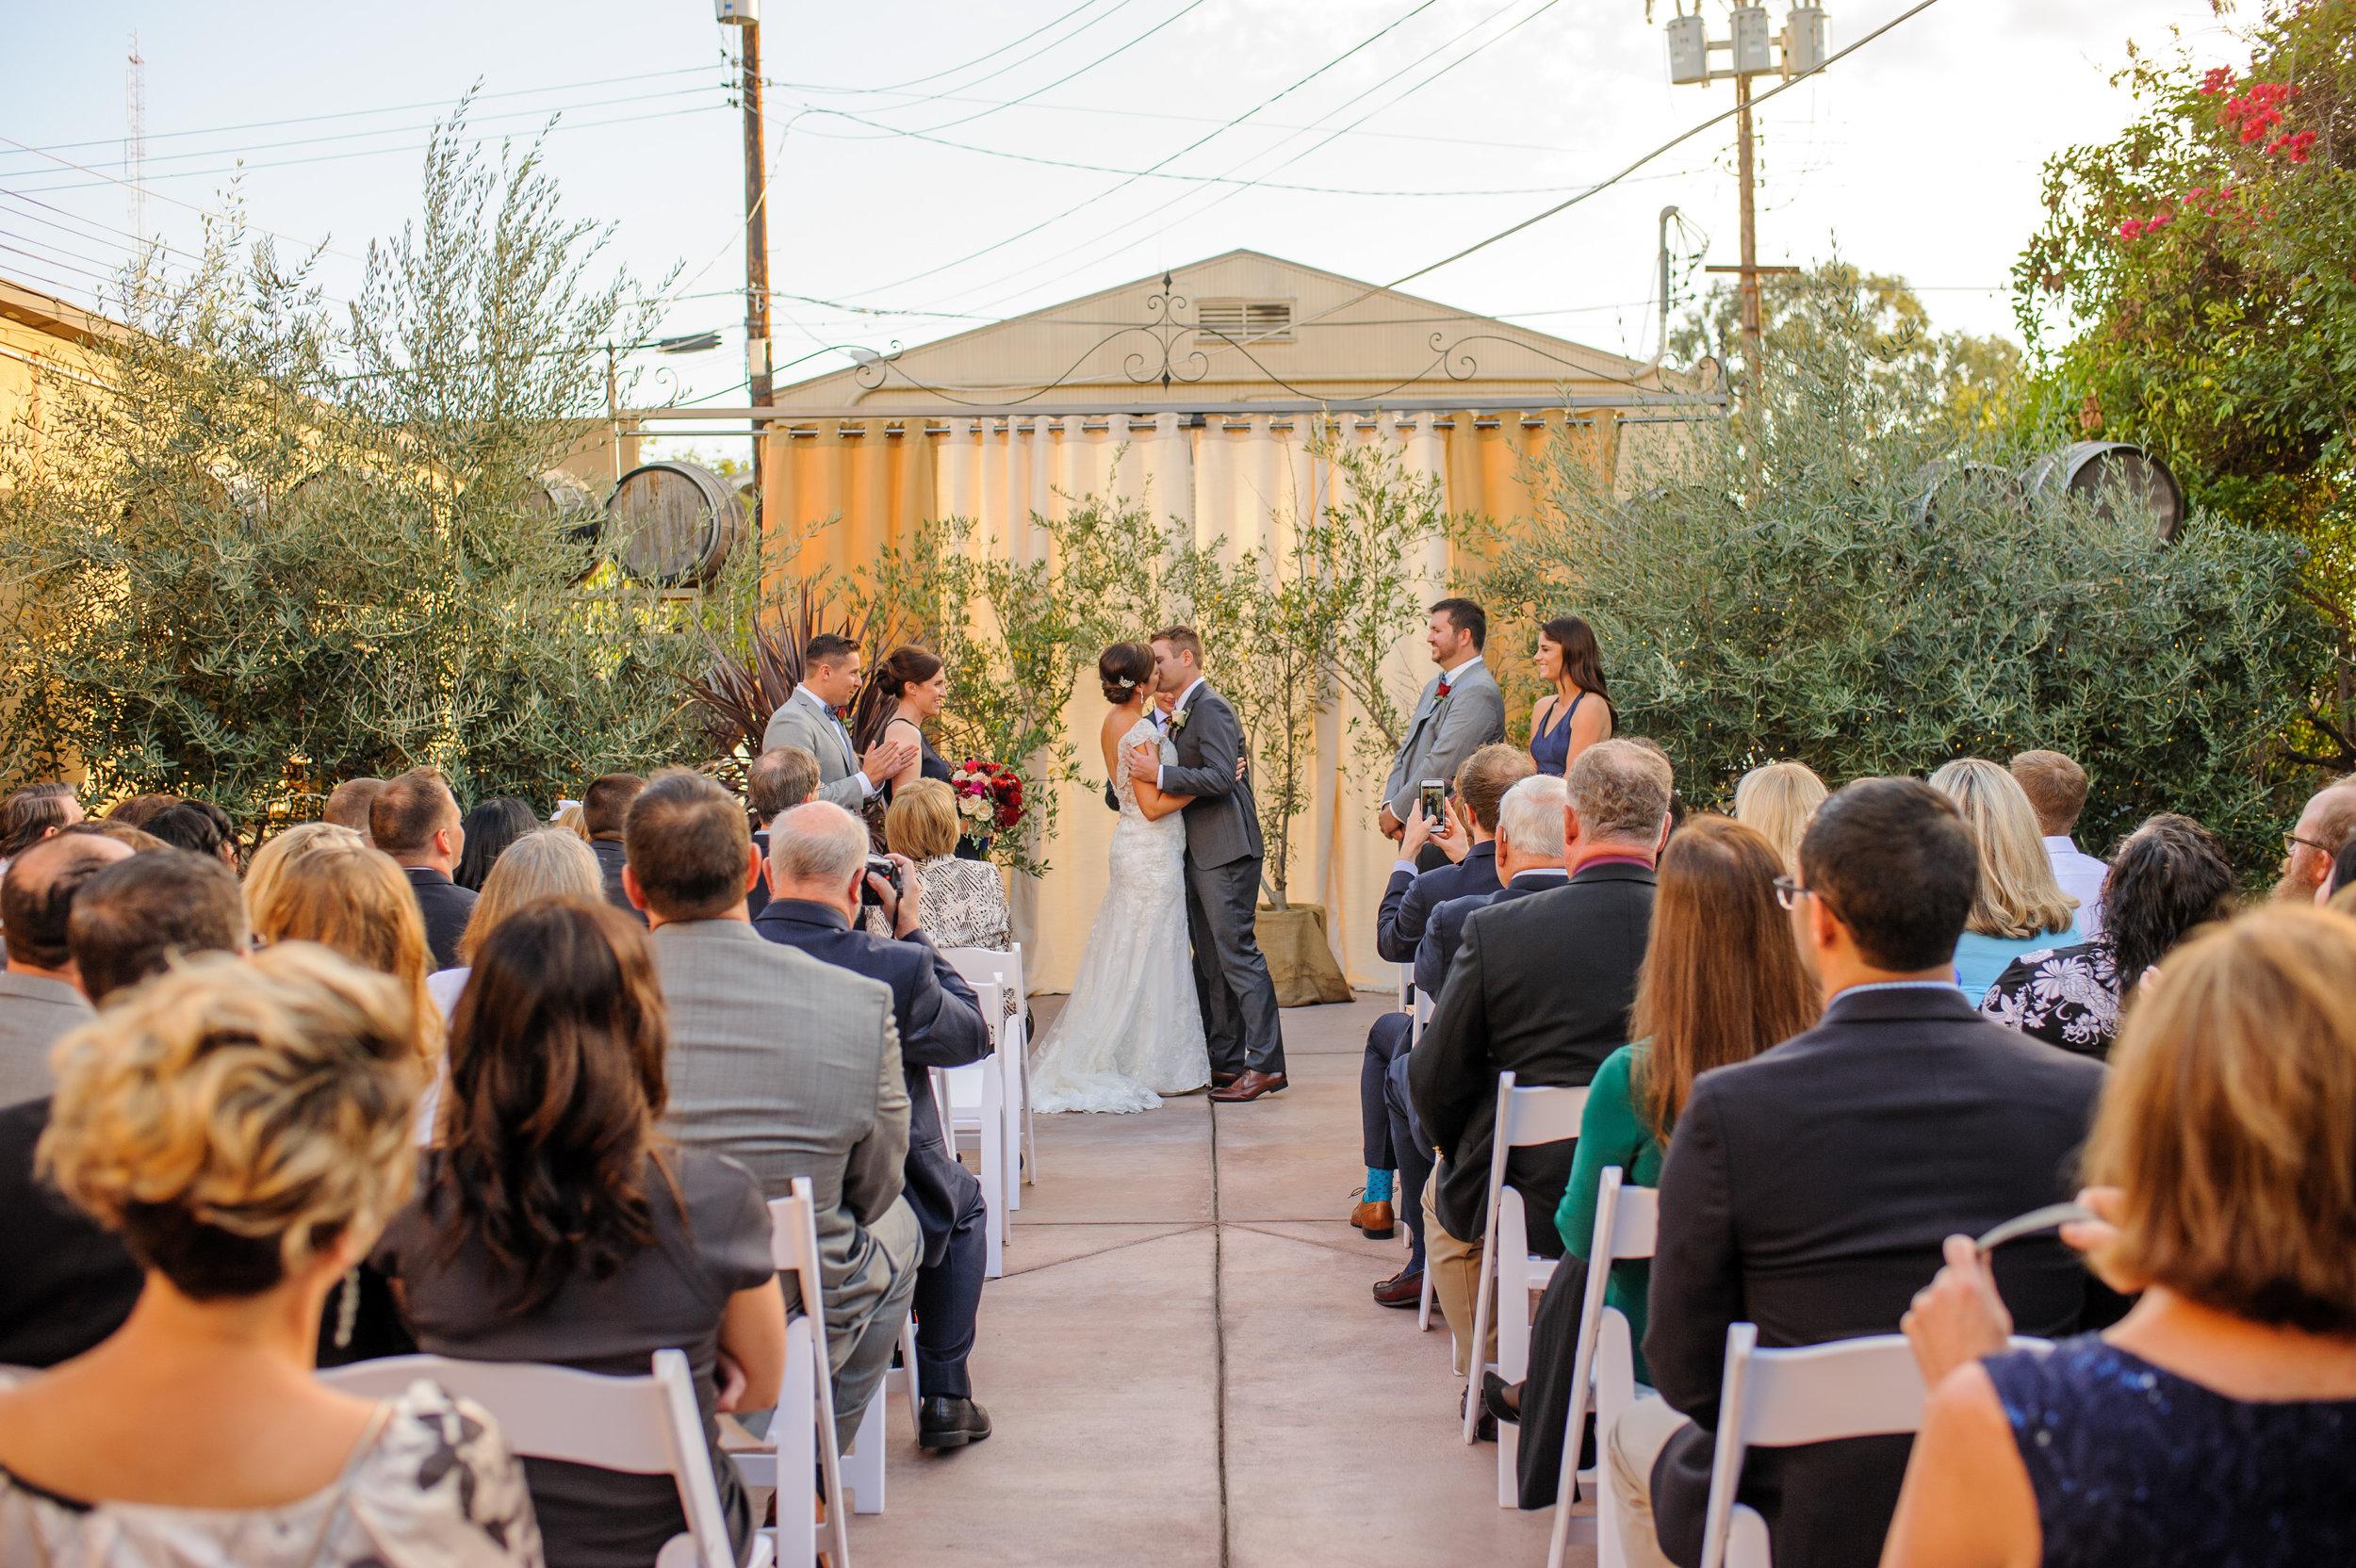 annie-brian-013-antiquite-midtown-sacramento-wedding-photographer-katherine-nicole-photography.JPG